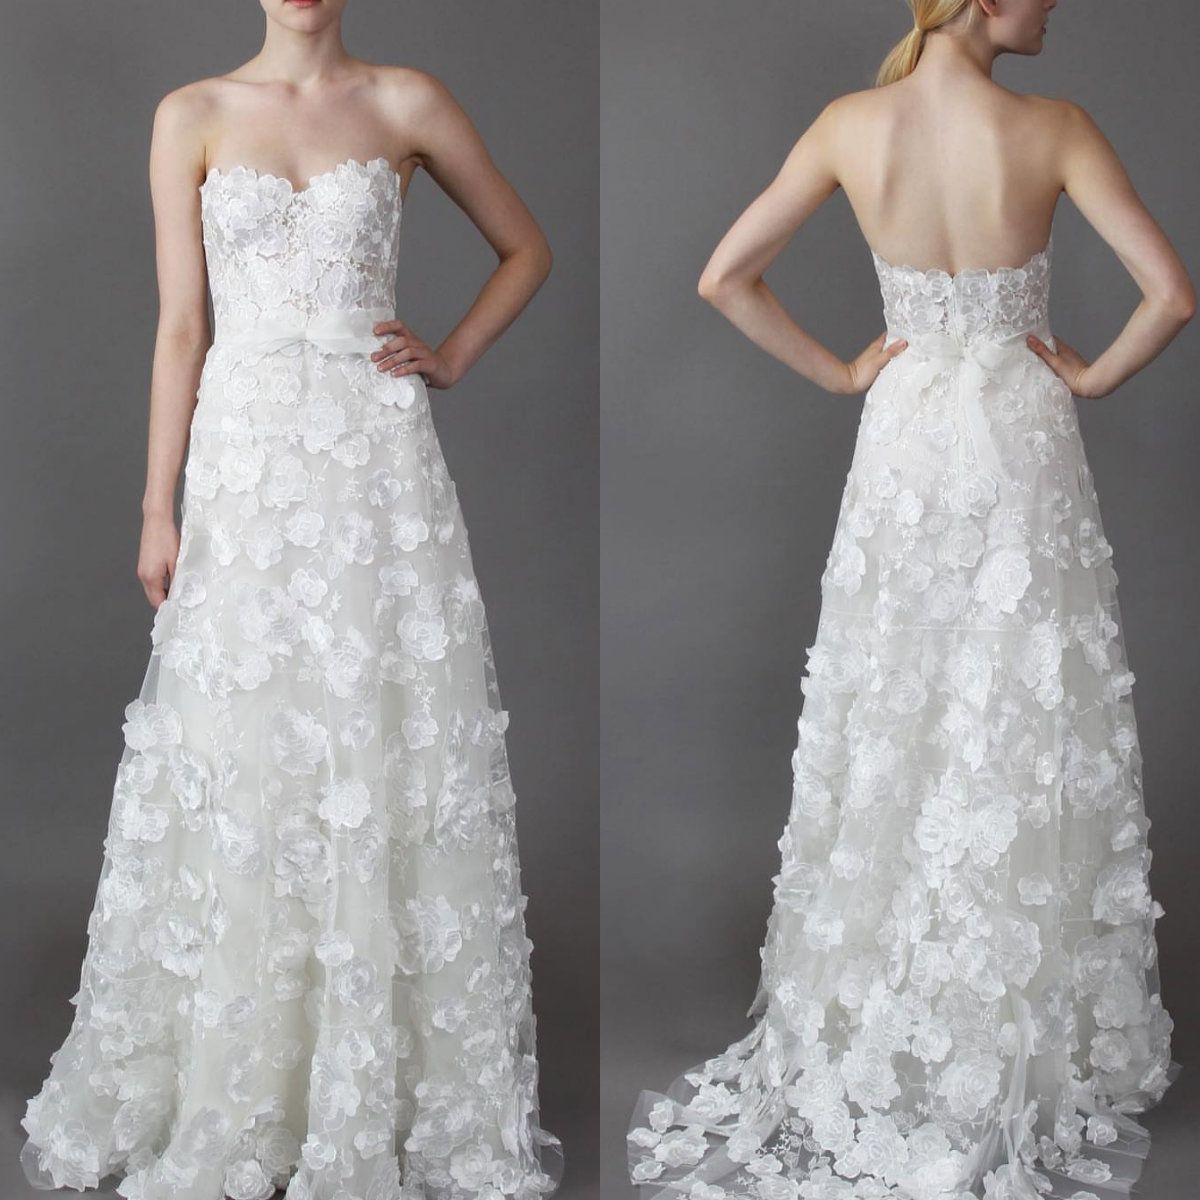 Mira Zwillinger 2018 vestido de novia Sweetheart Strapless 3D apliques florales cintura de cintura vestidos de novia Vestidos de boda del jardín